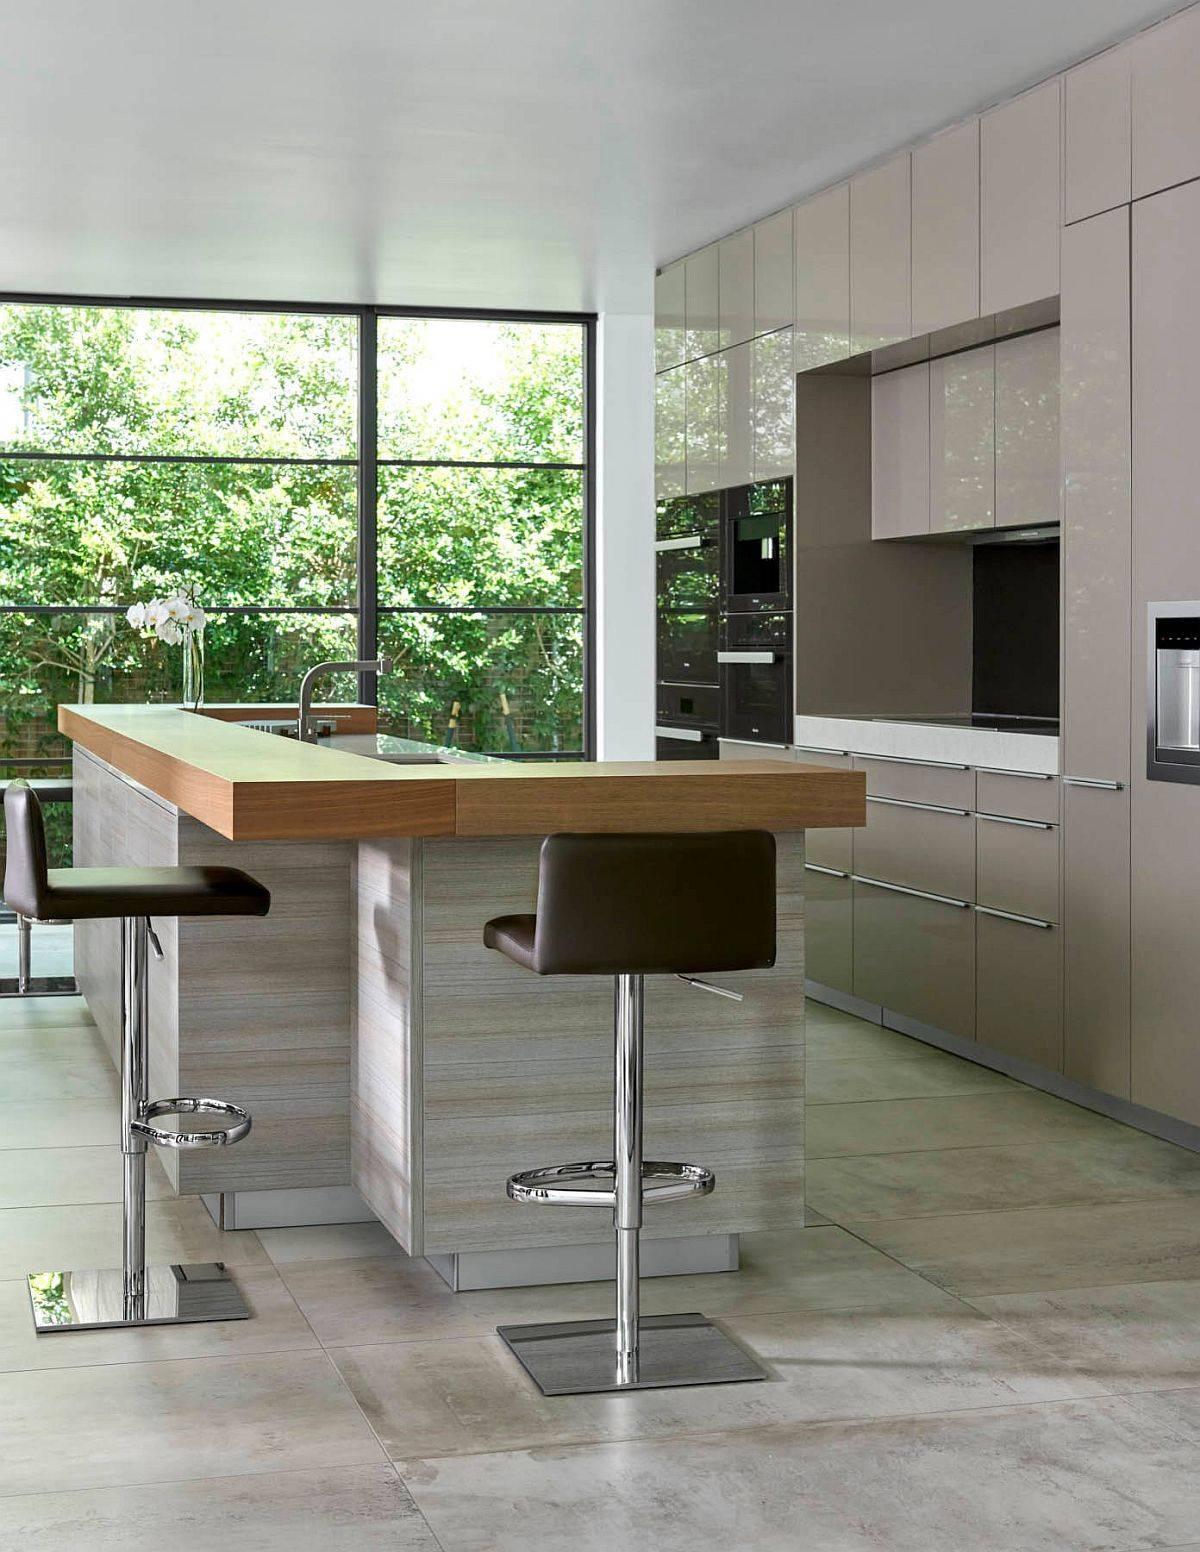 Breakfast-bar-in-wood-wraps-around-the-kitchen-island-in-style-63790